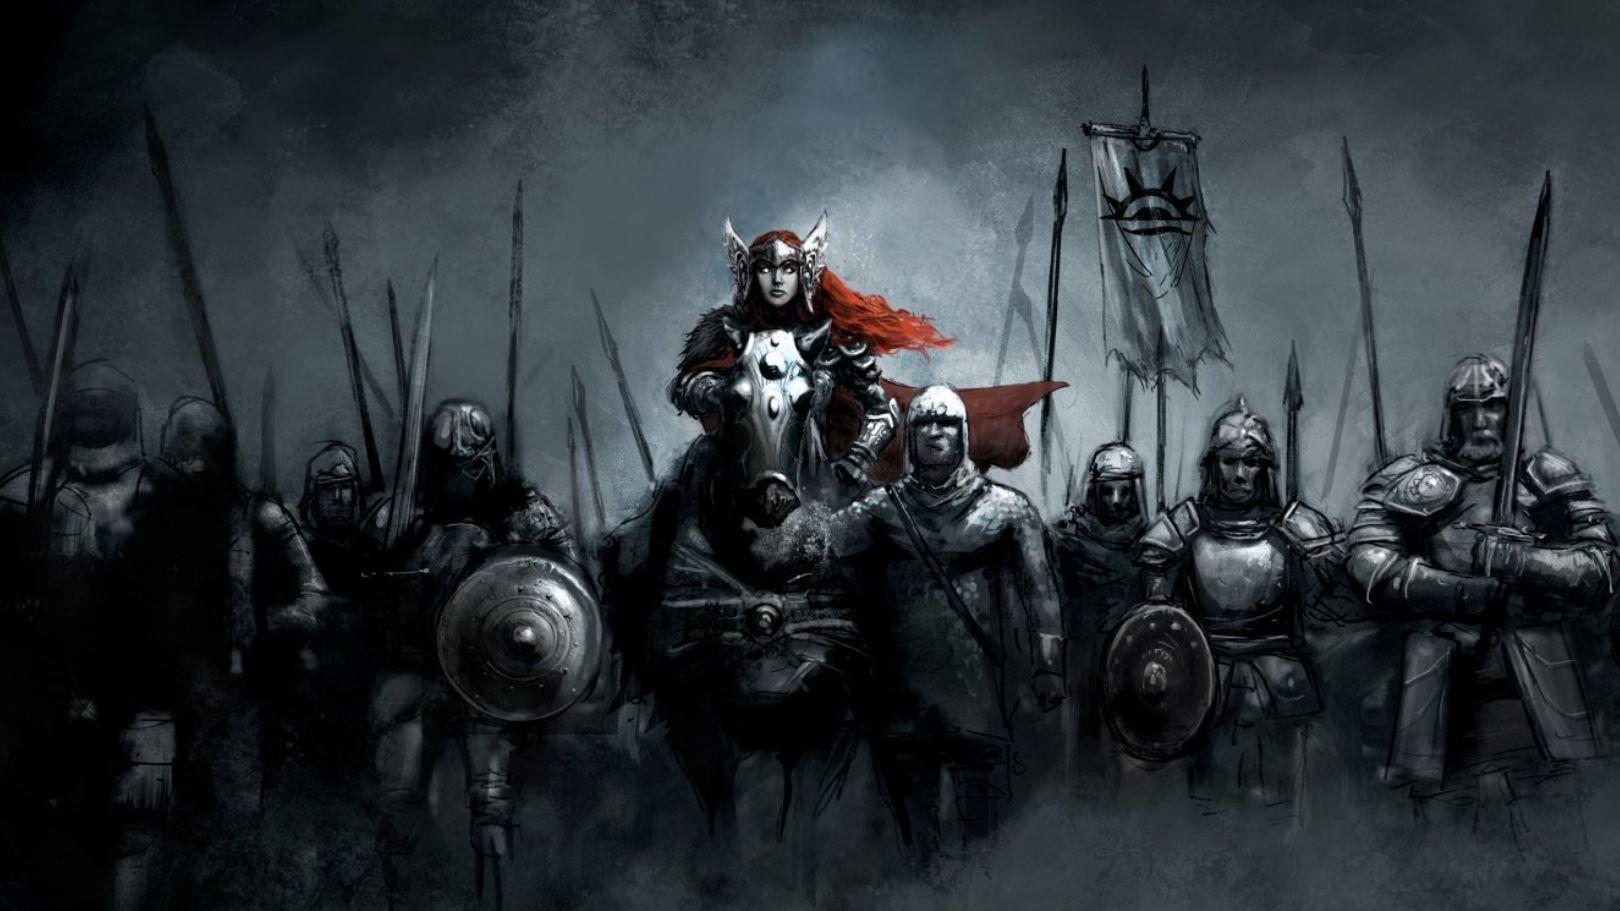 Baldur S Gate Siege Of Dragonspear To Hit Android This Week Army Wallpaper Artwork Art